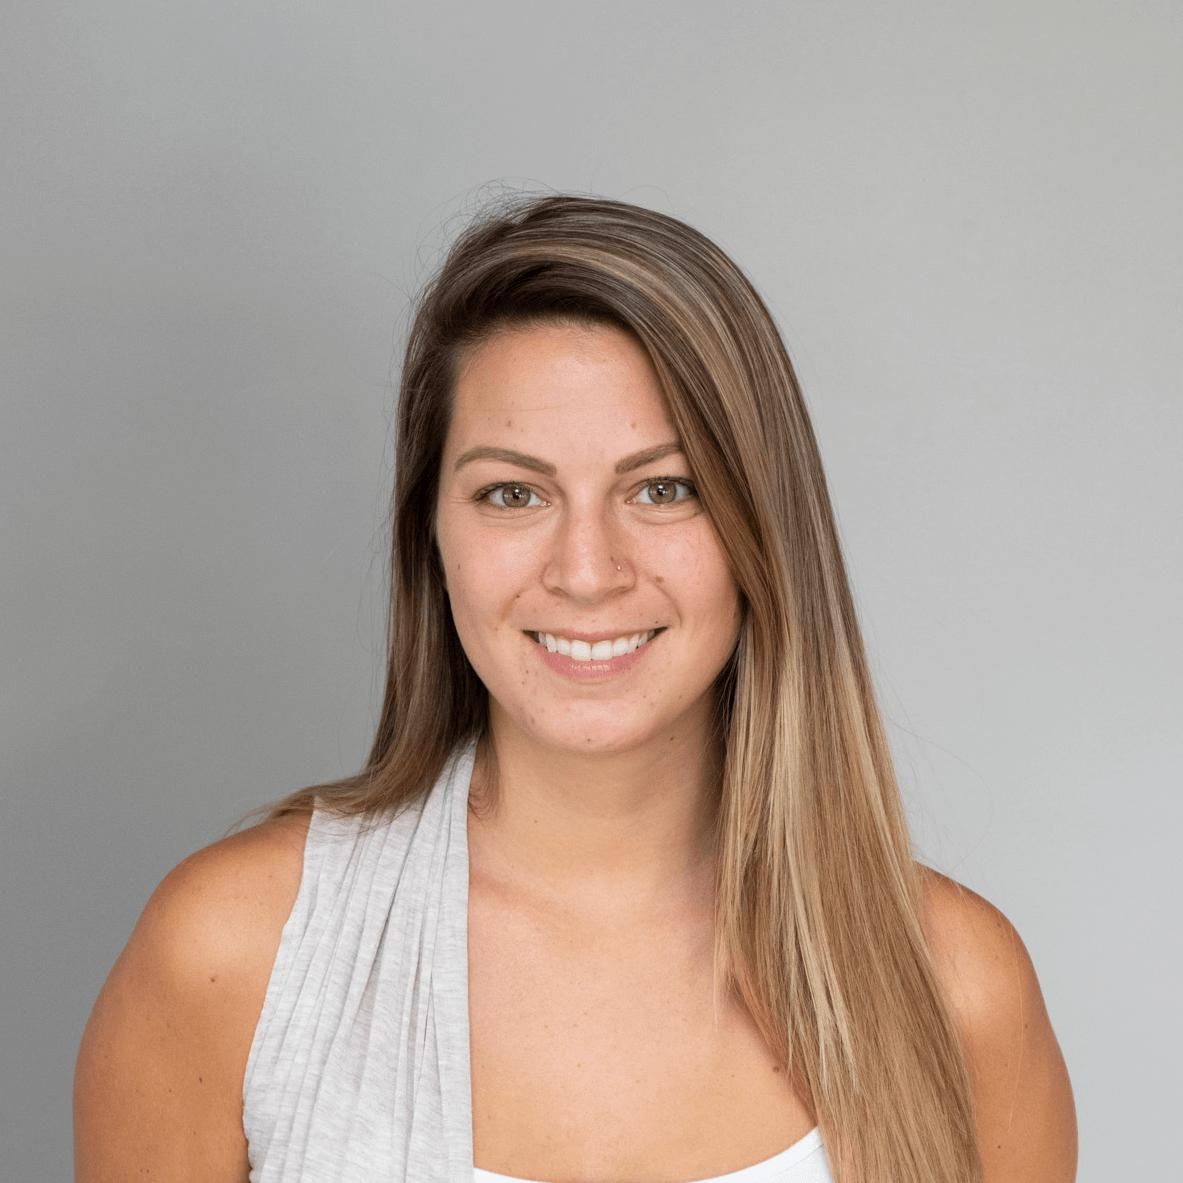 Nicole Lavo